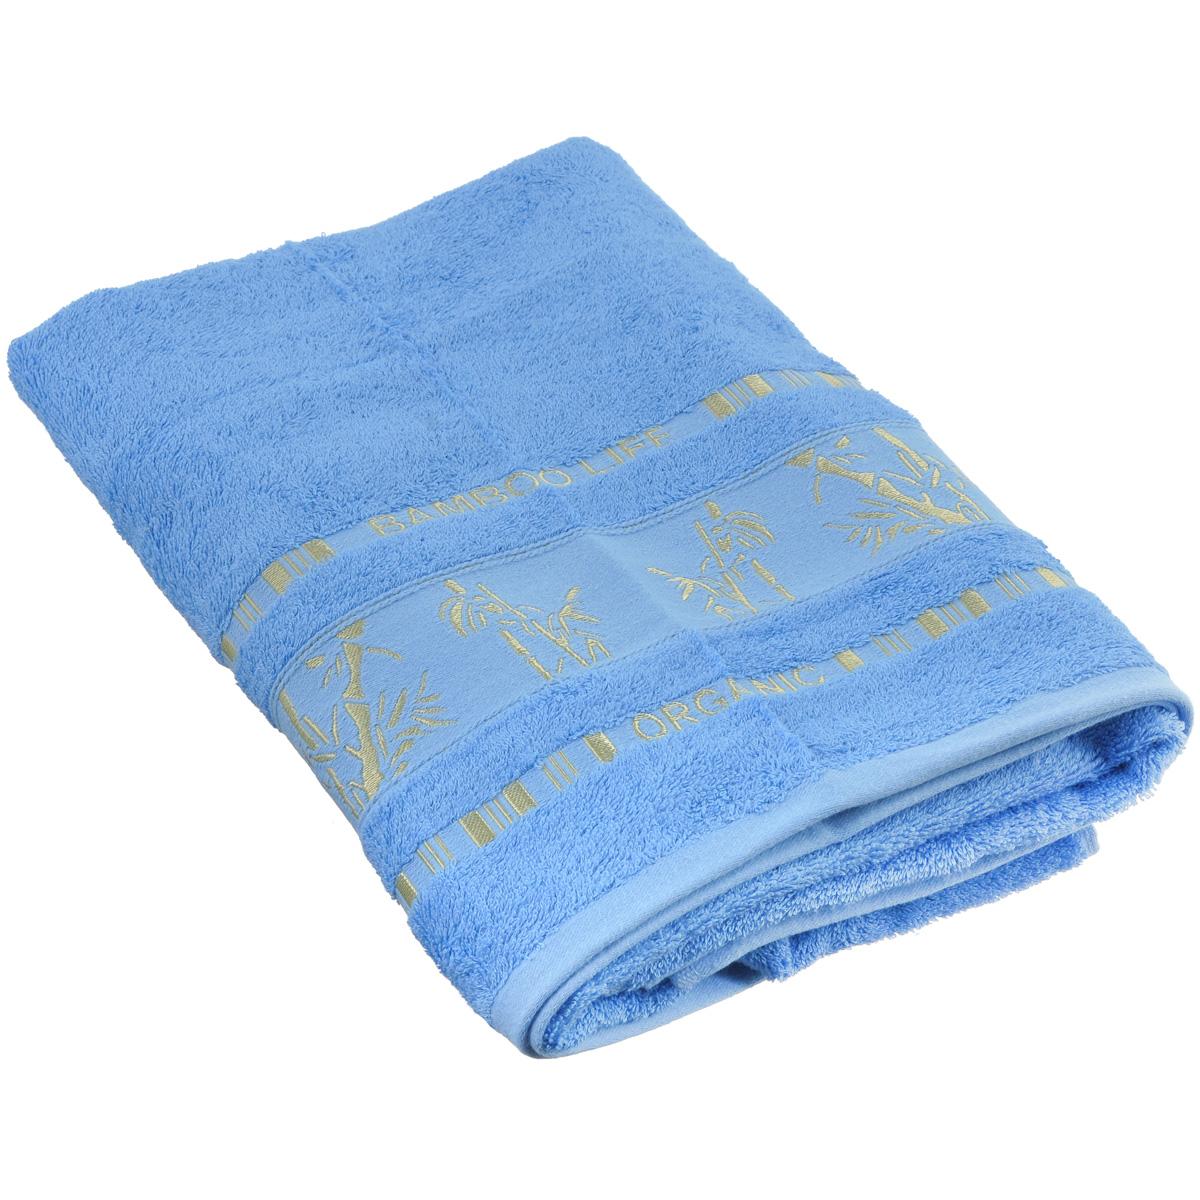 "Полотенце Mariposa ""Bamboo"", цвет: голубой, 70 см х 140 см"